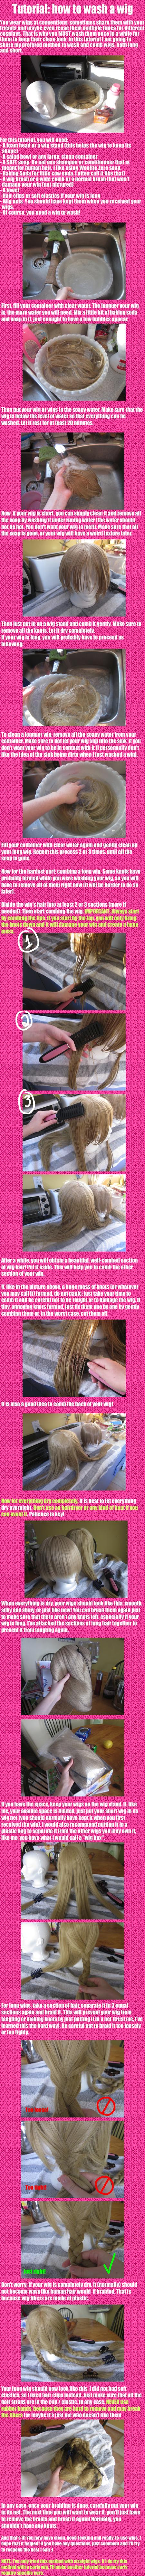 Tutorial: How to wash a wig by Kisshu-Neko